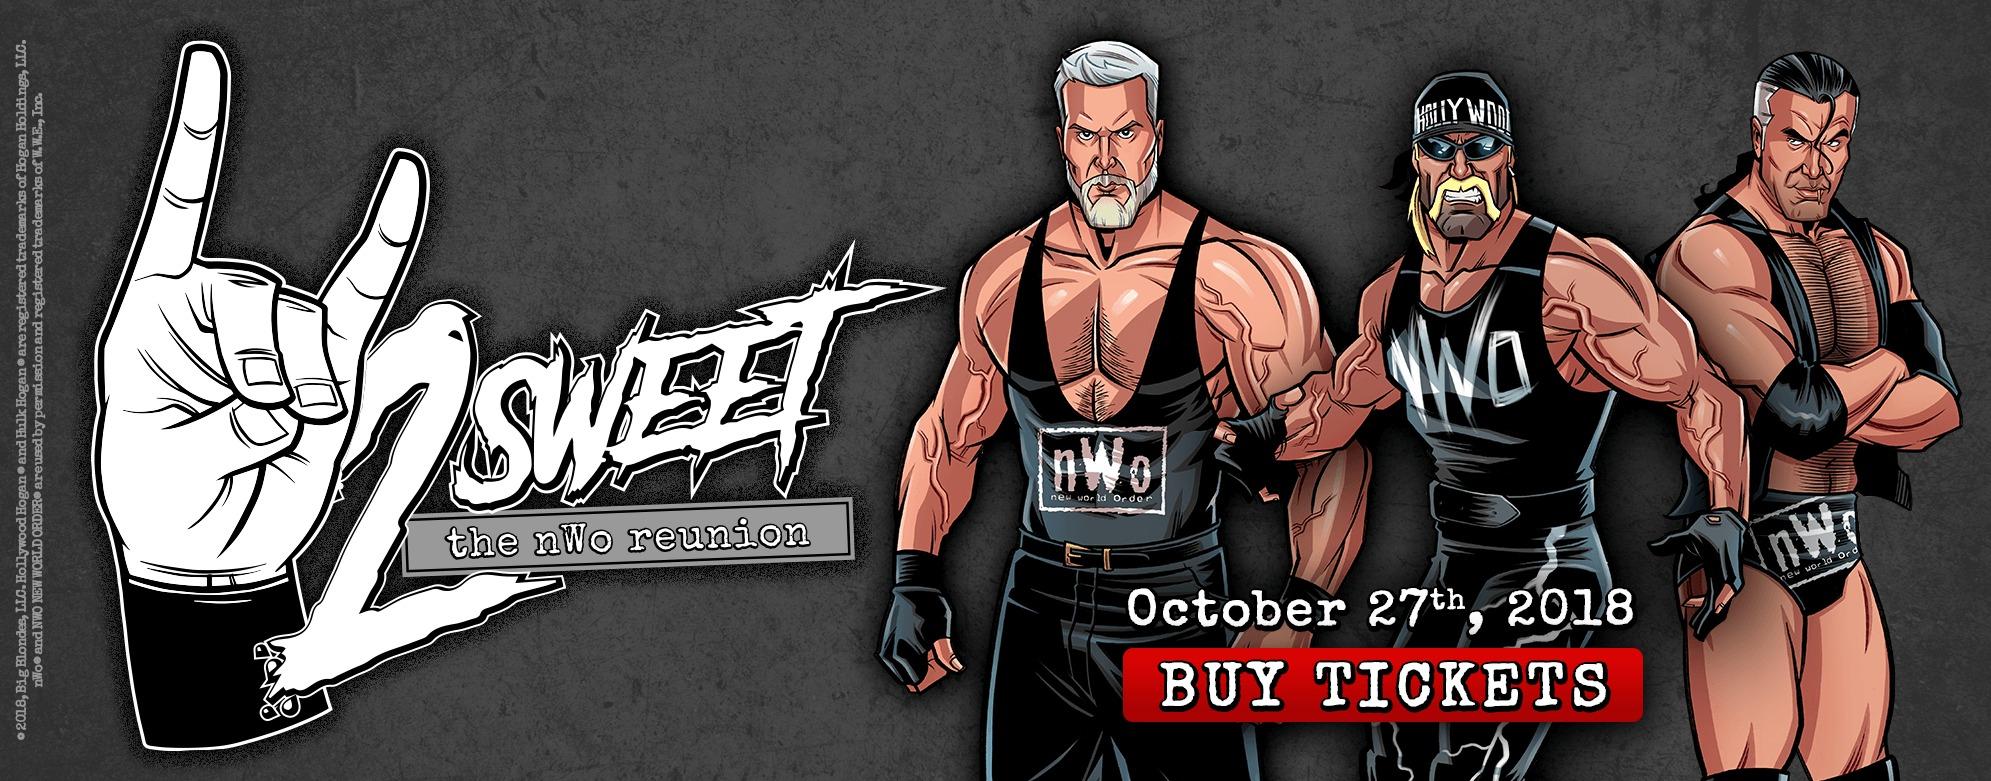 2 Sweet Tour Header Banner with Scott Hall, Kevin Nash, and Hollywood Hulk Hogan